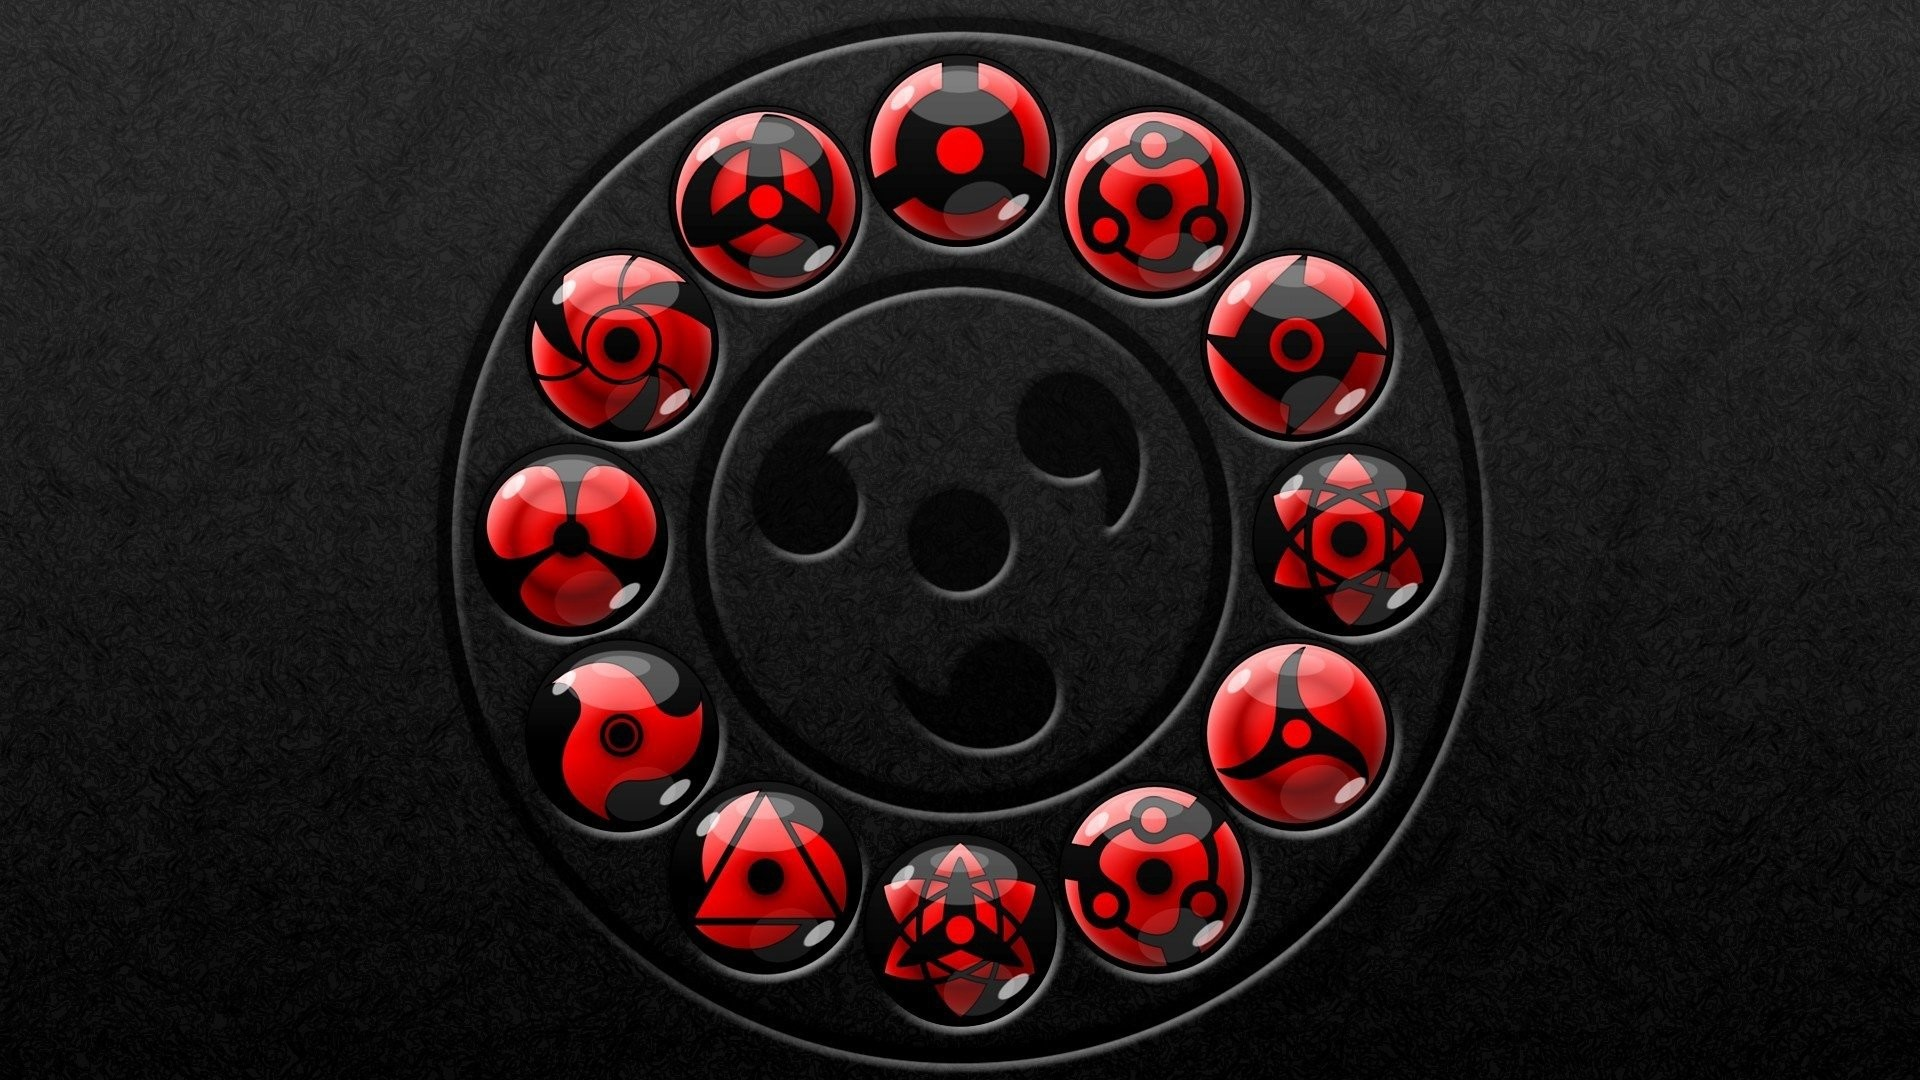 Hd sharingan wallpaper 62 images 1920x1080 hd wallpaper background id644140 voltagebd Gallery